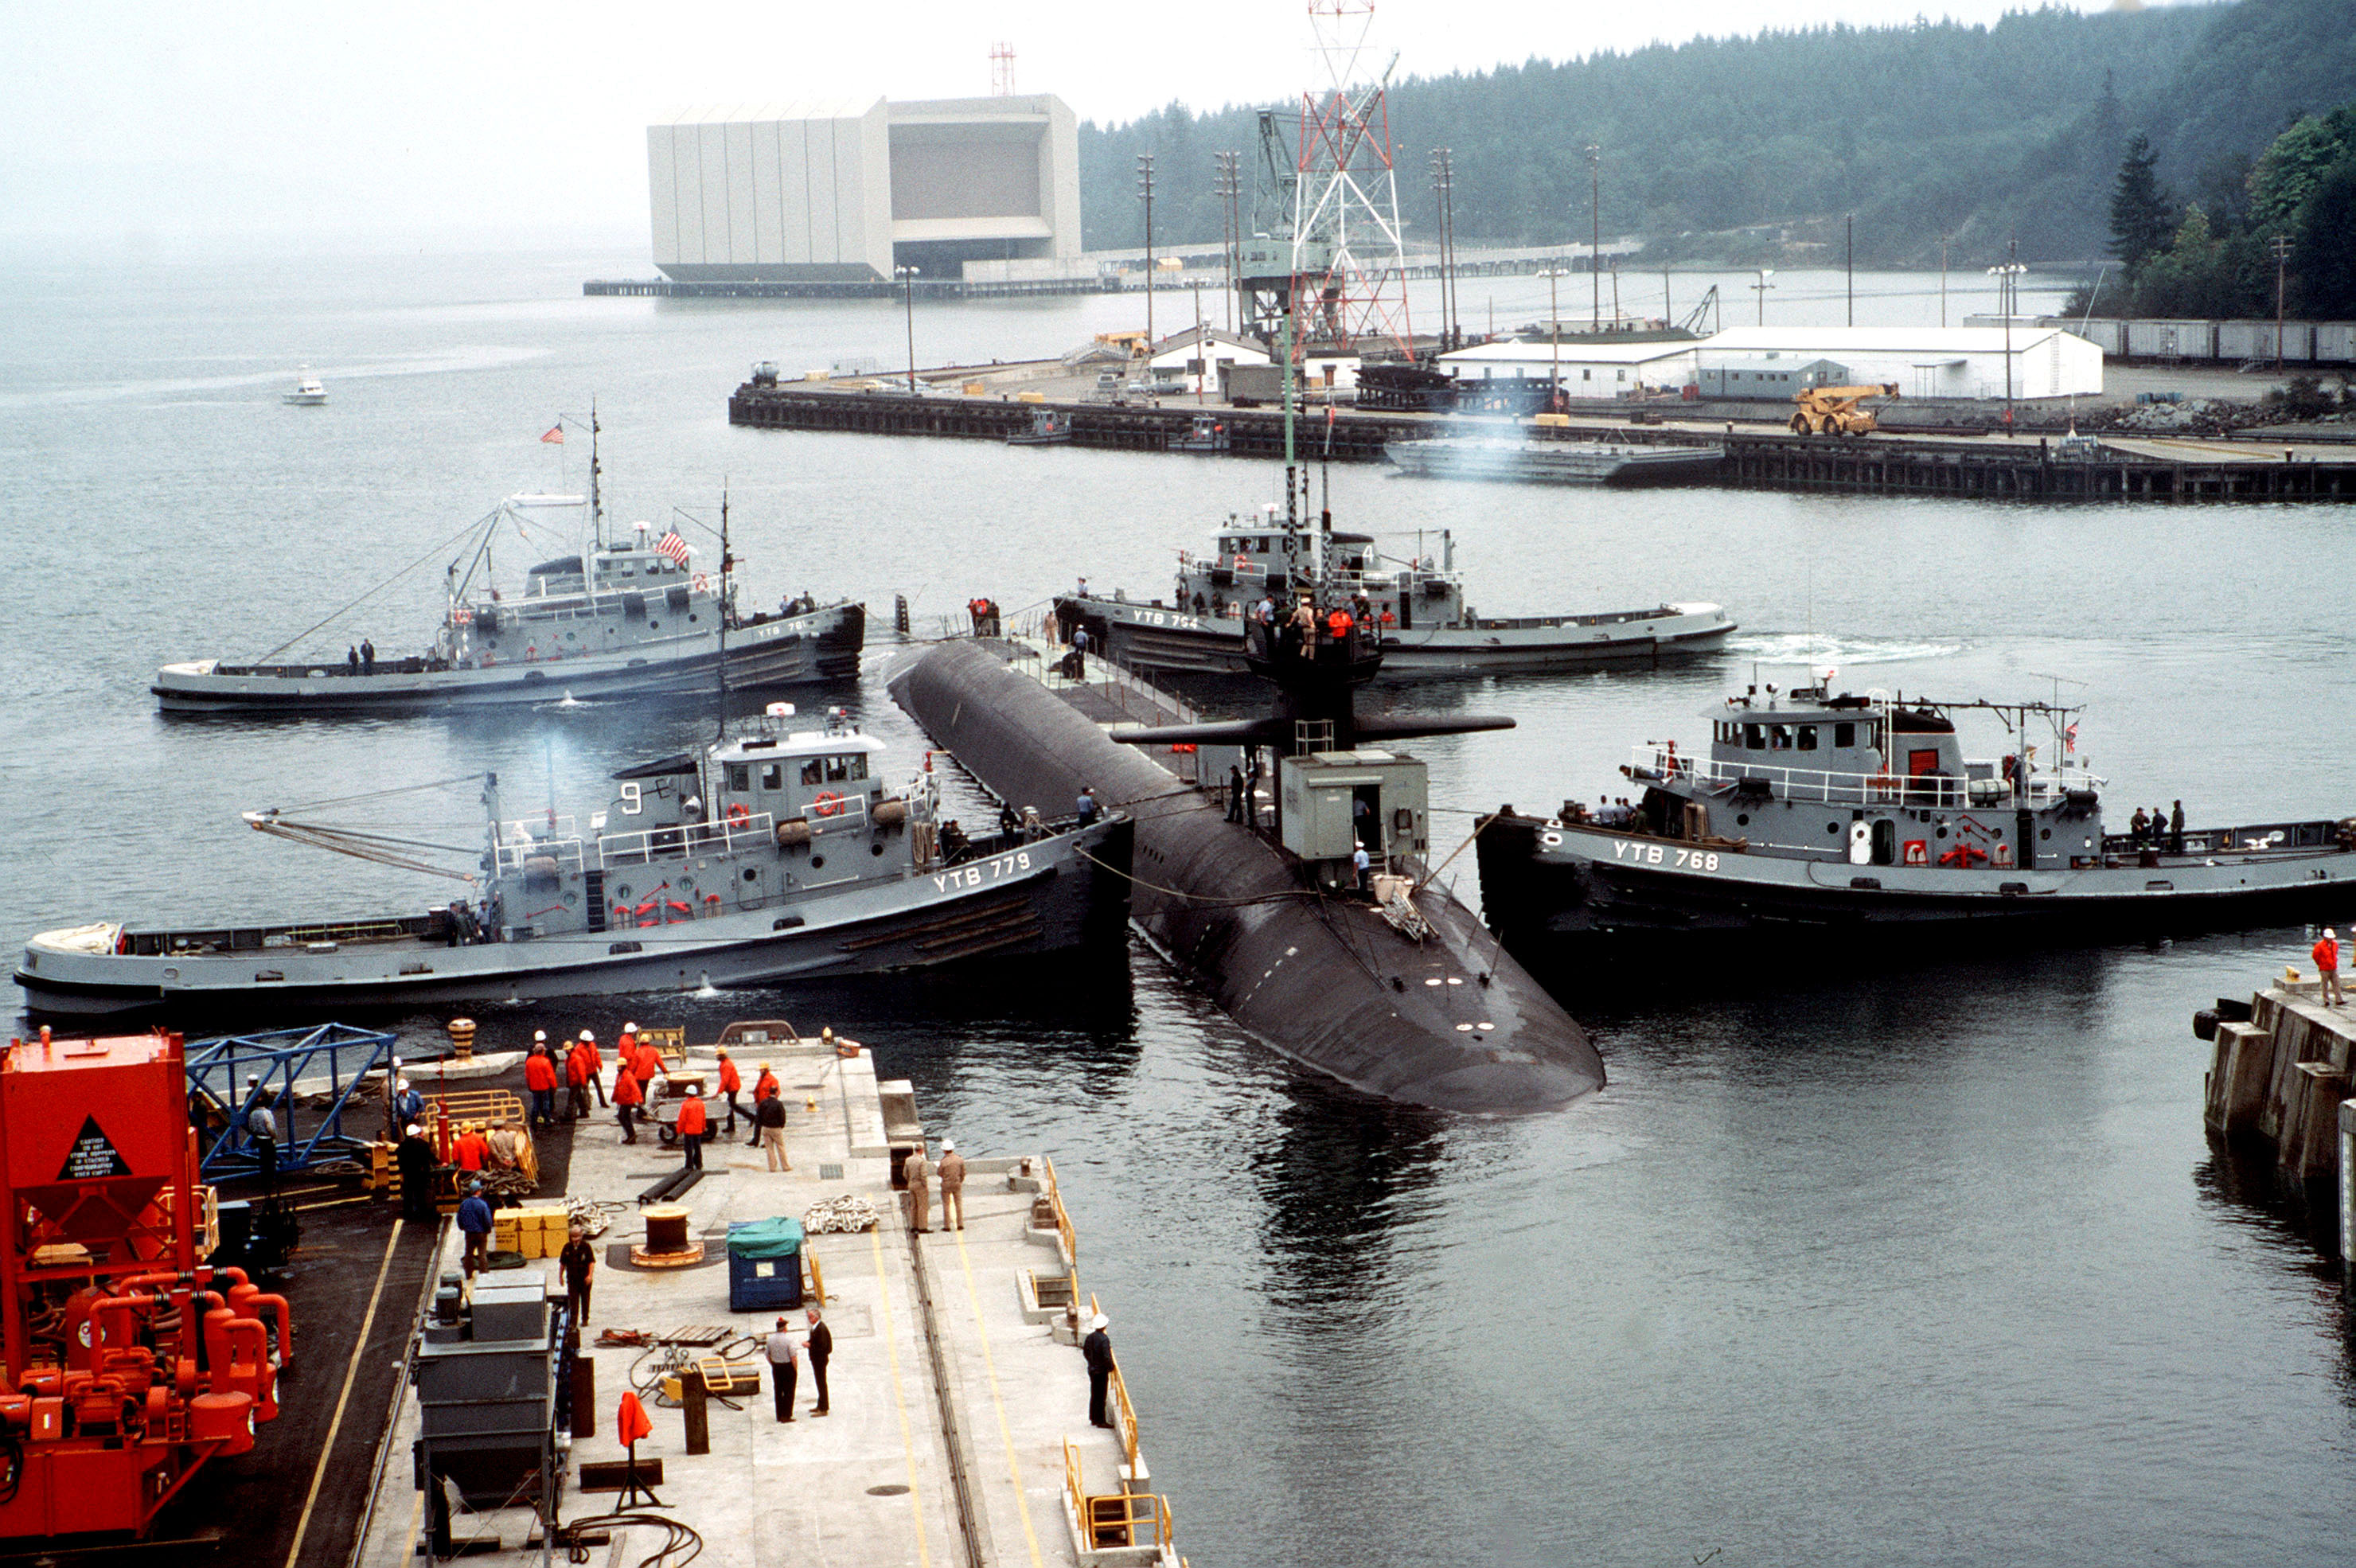 Four Natick class harbor tugs guide USS Ohio (SSBN-726) out of drydock.jpg